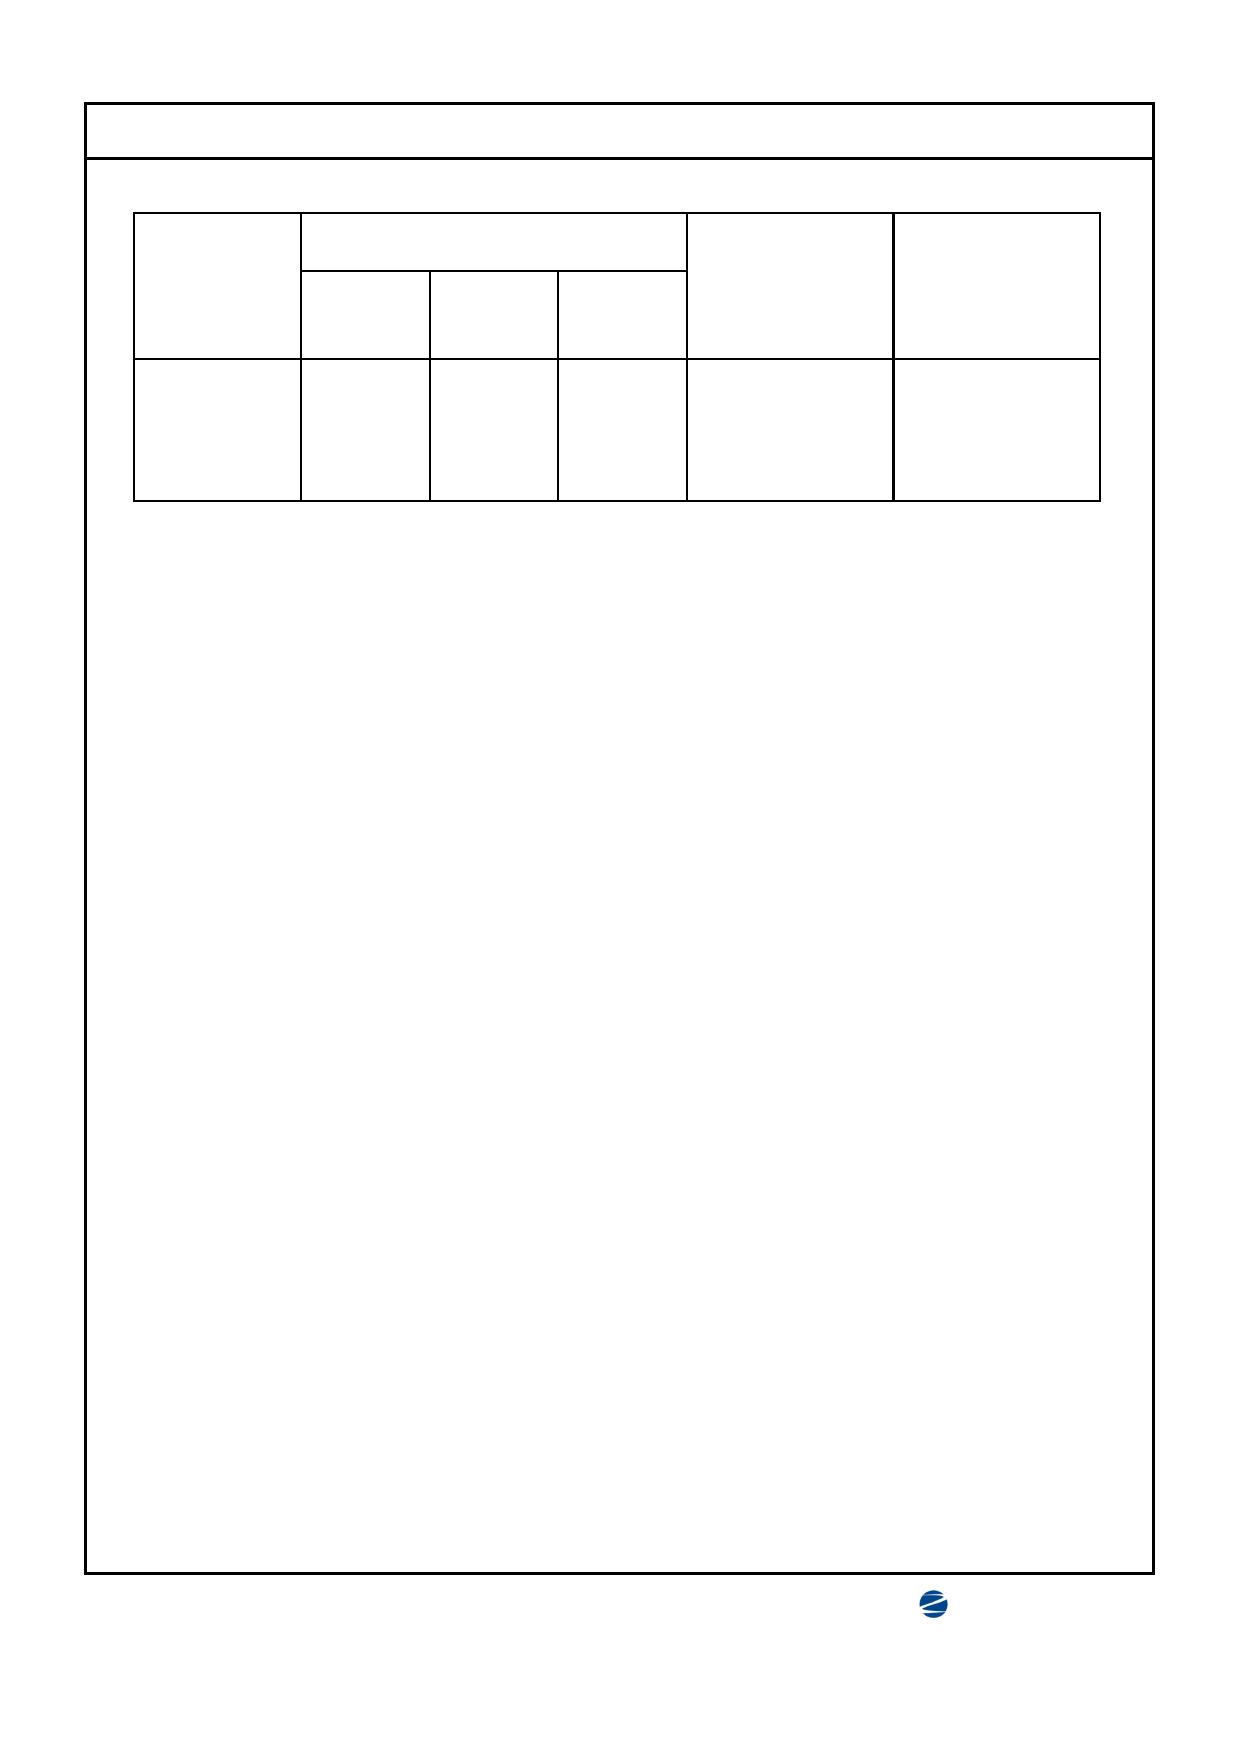 MBR10100CTSH pdf, ピン配列